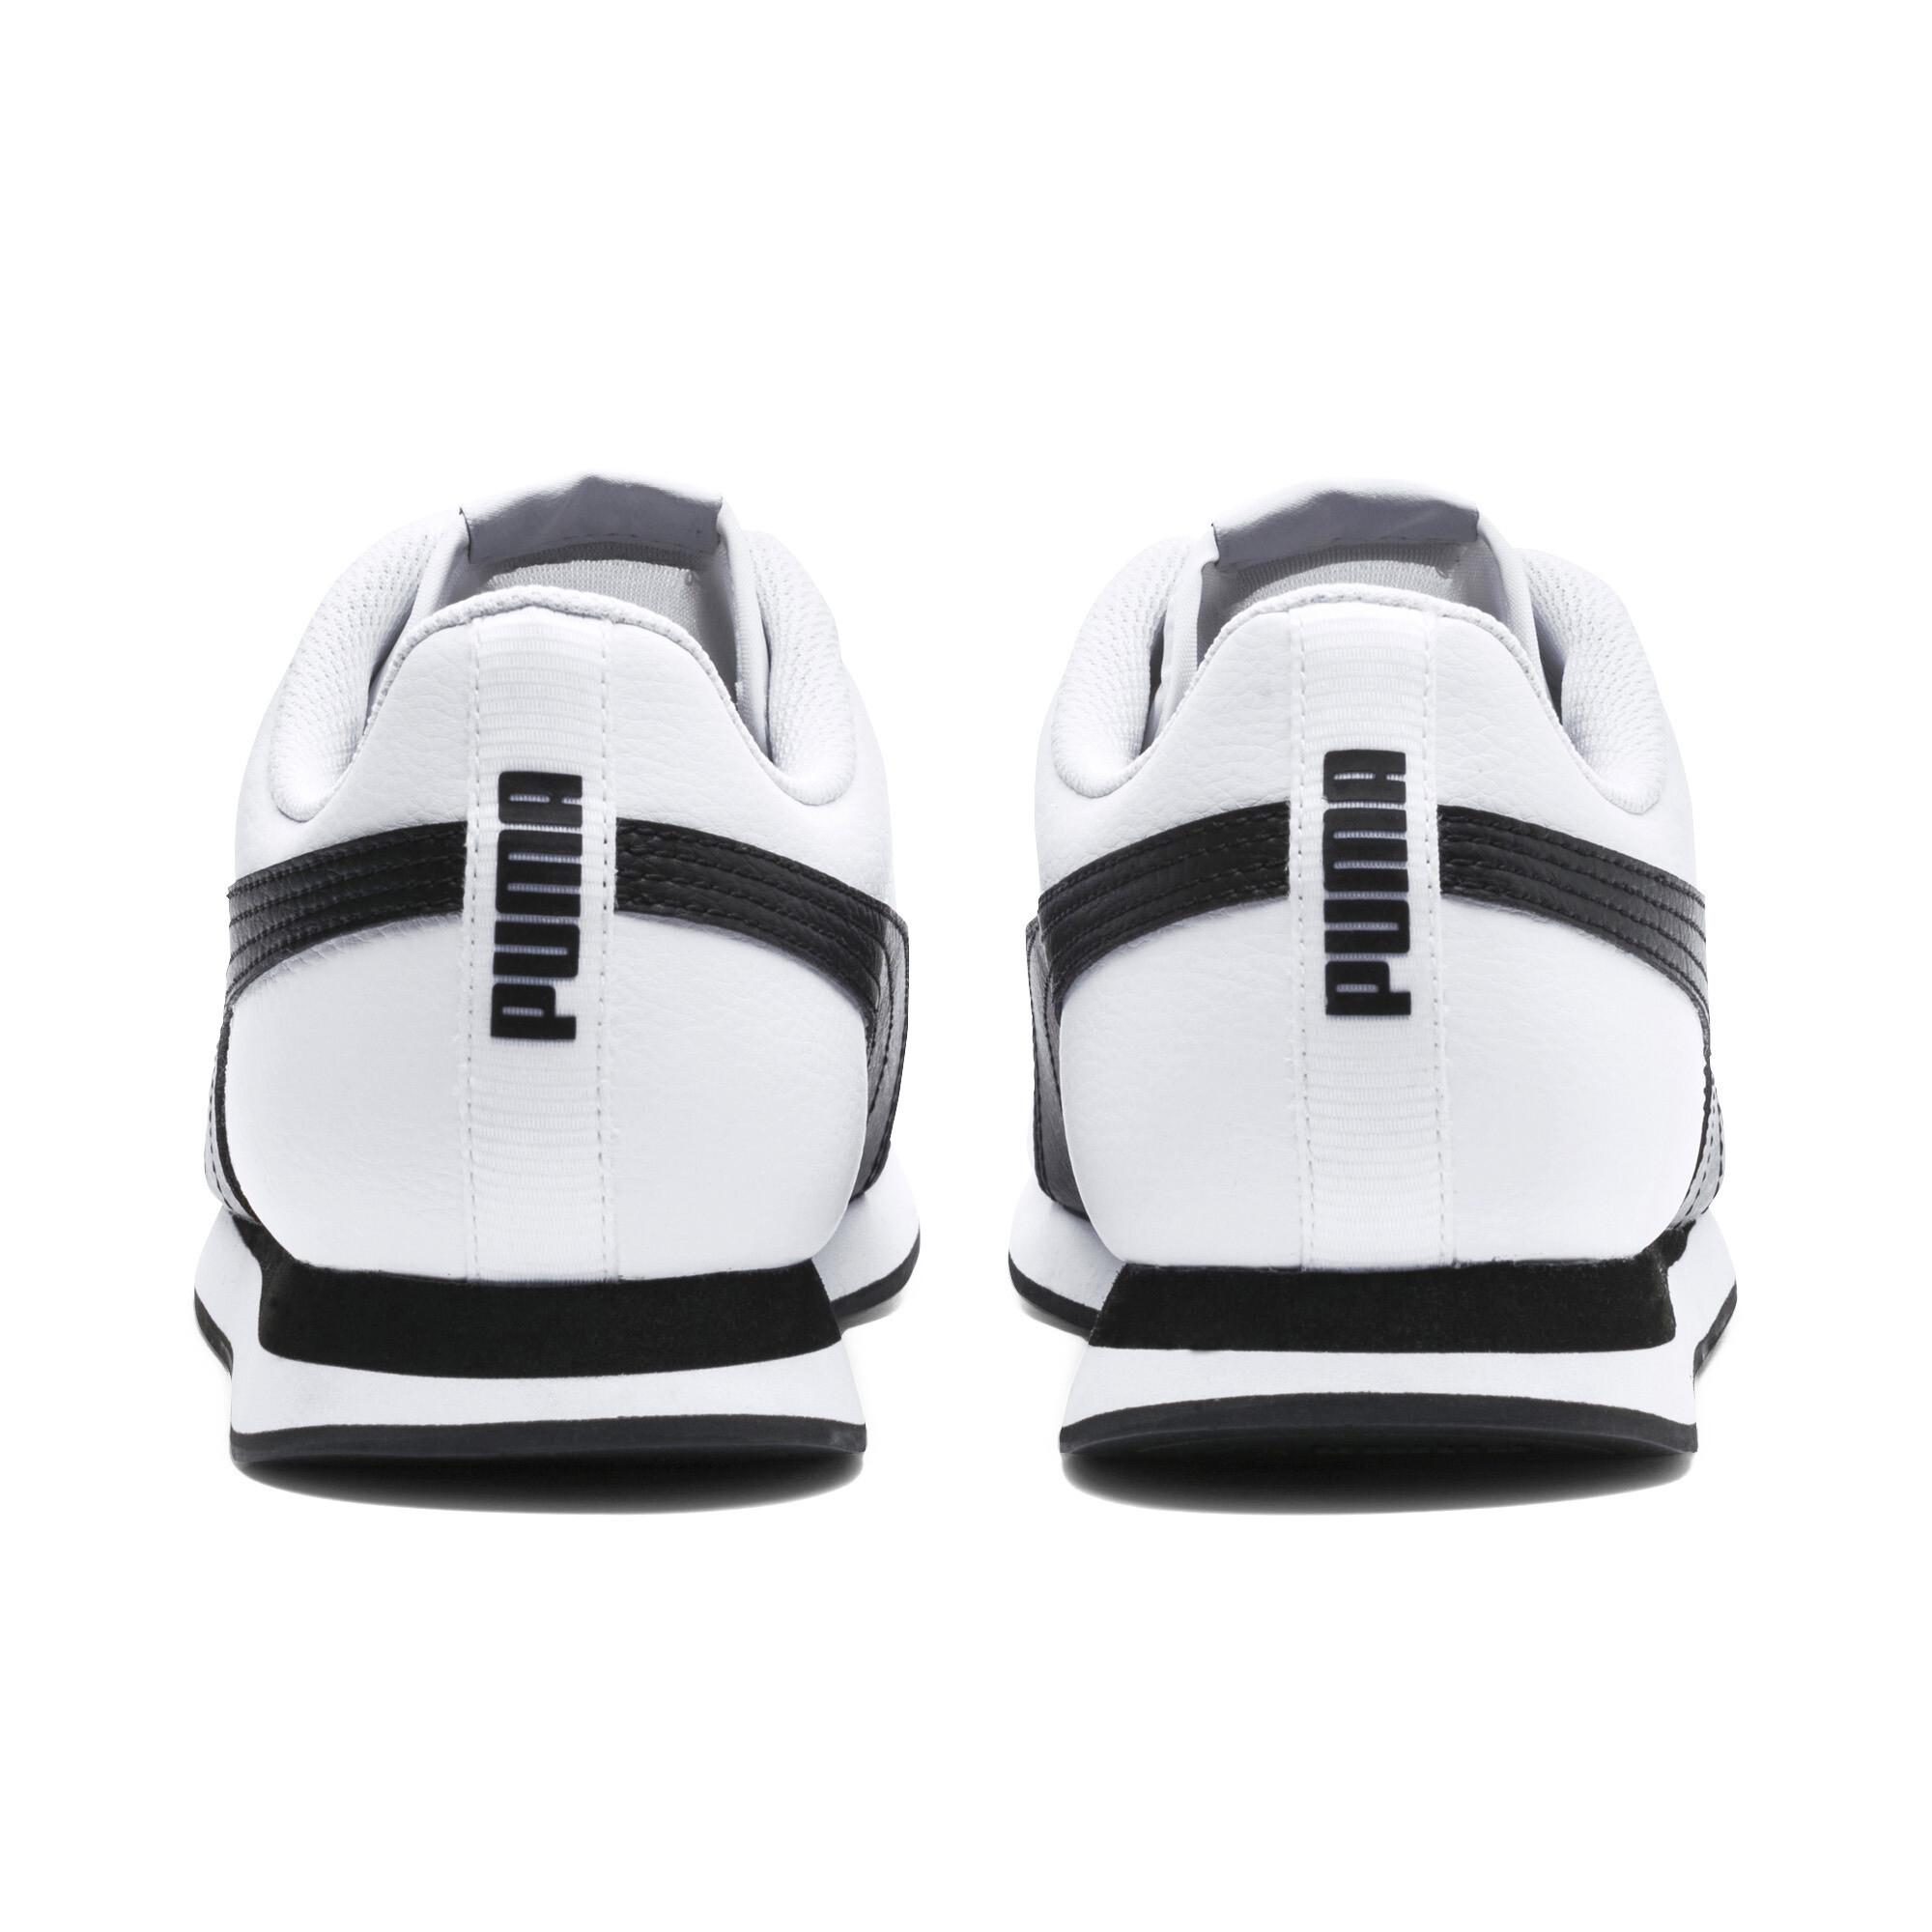 thumbnail 18 - PUMA Men's Turin II Sneakers